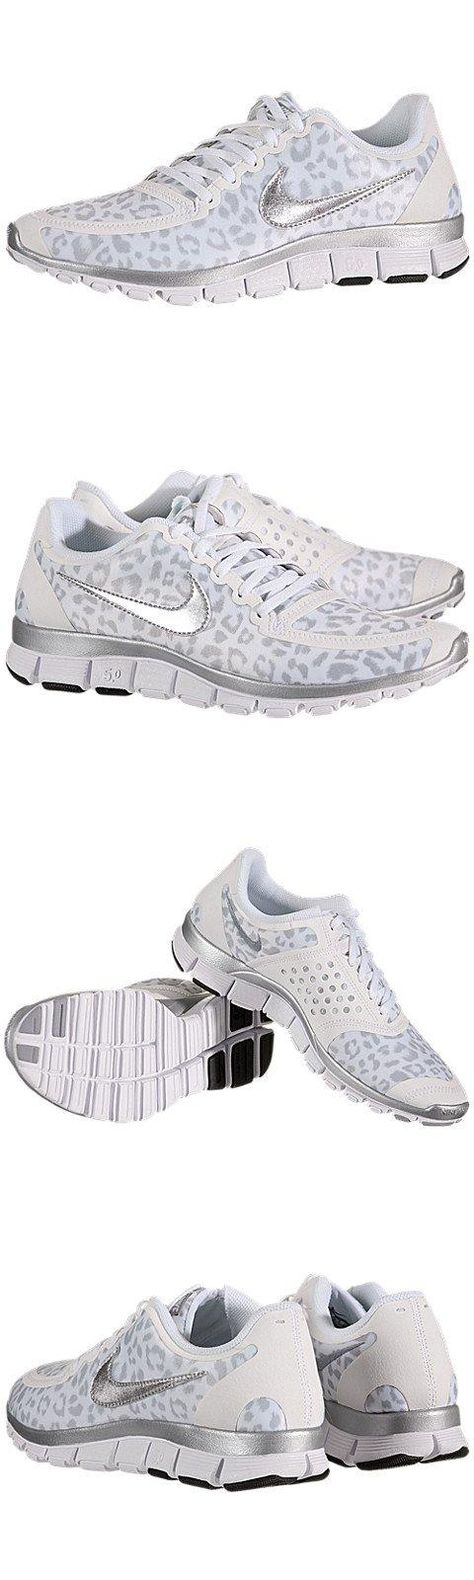 Nike Women's Free 5.0 V4 White/Metallic Silver/Wlf Grey Running Shoes 7.5 Women US, Nike Women's Free 5.0 V4 Running Shoes, #Apparel, #Running